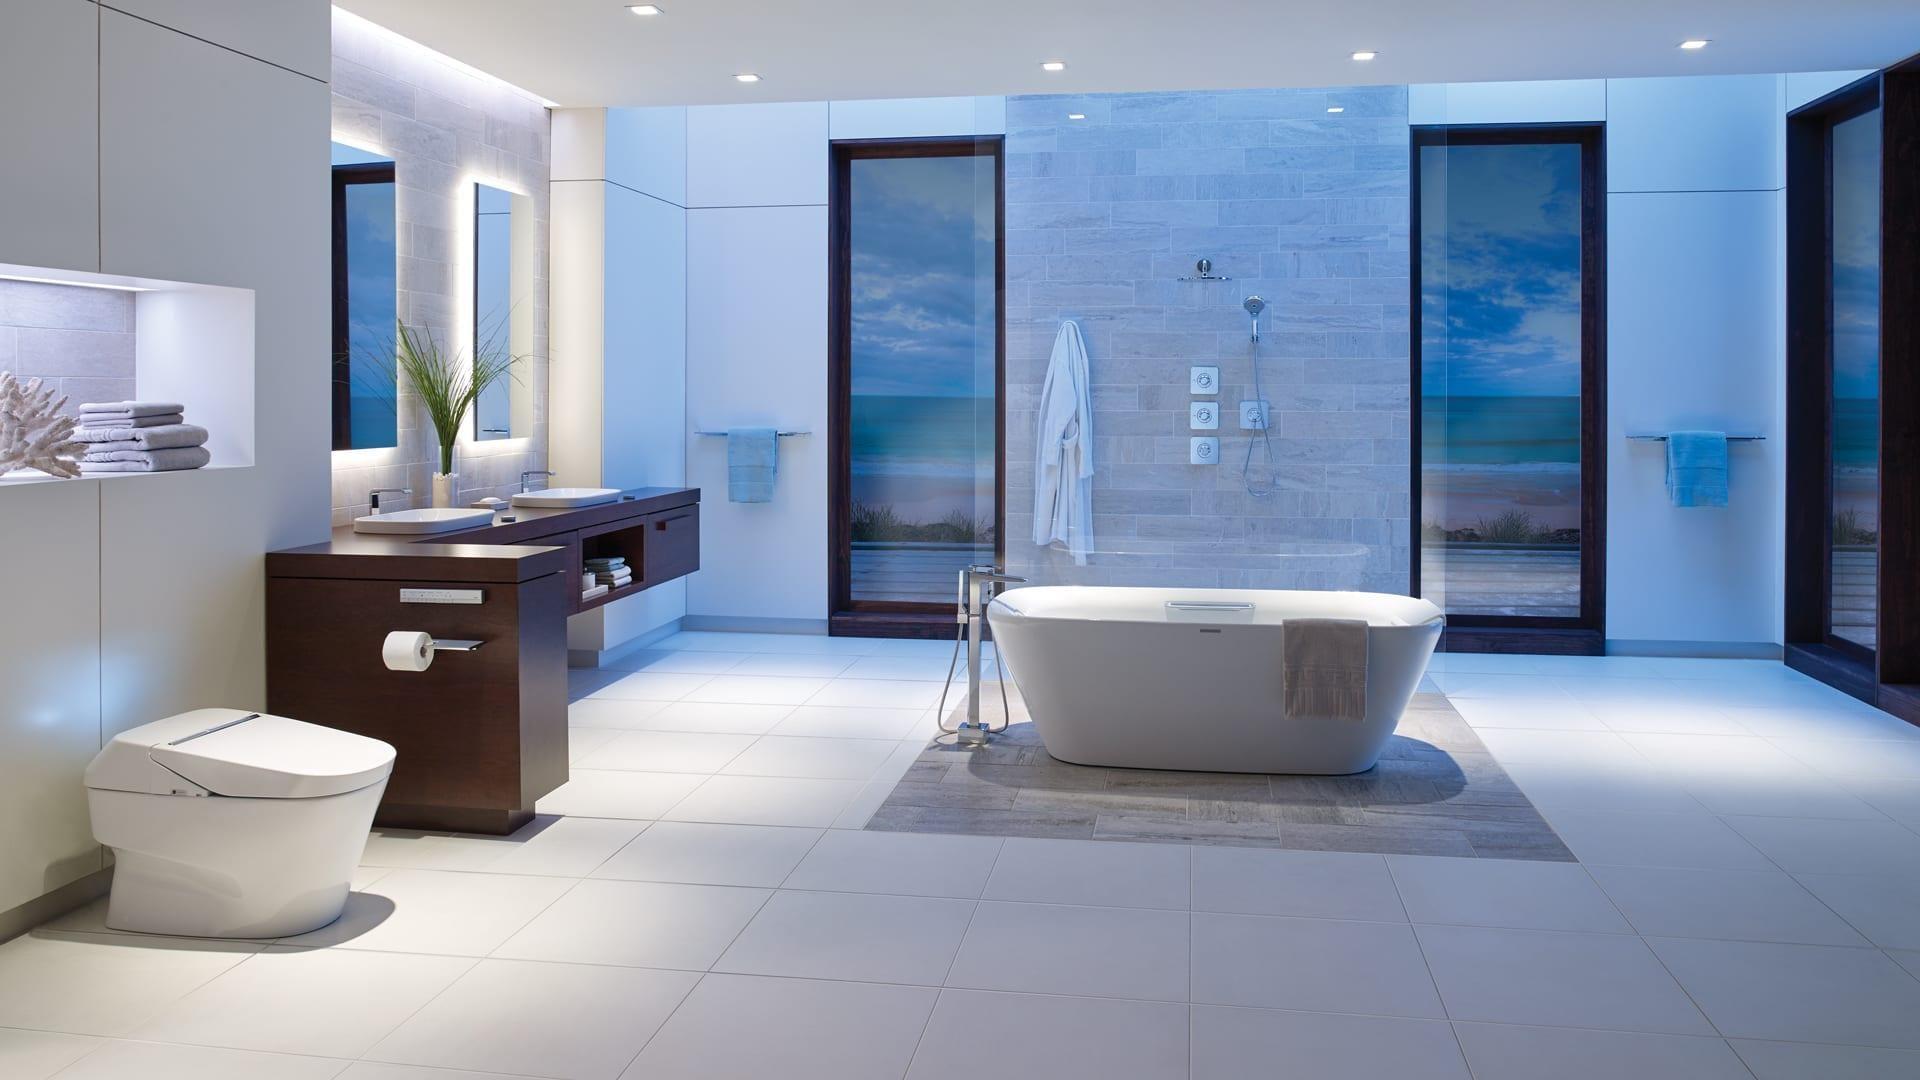 PerfectFill Bath by Kohler Konnect